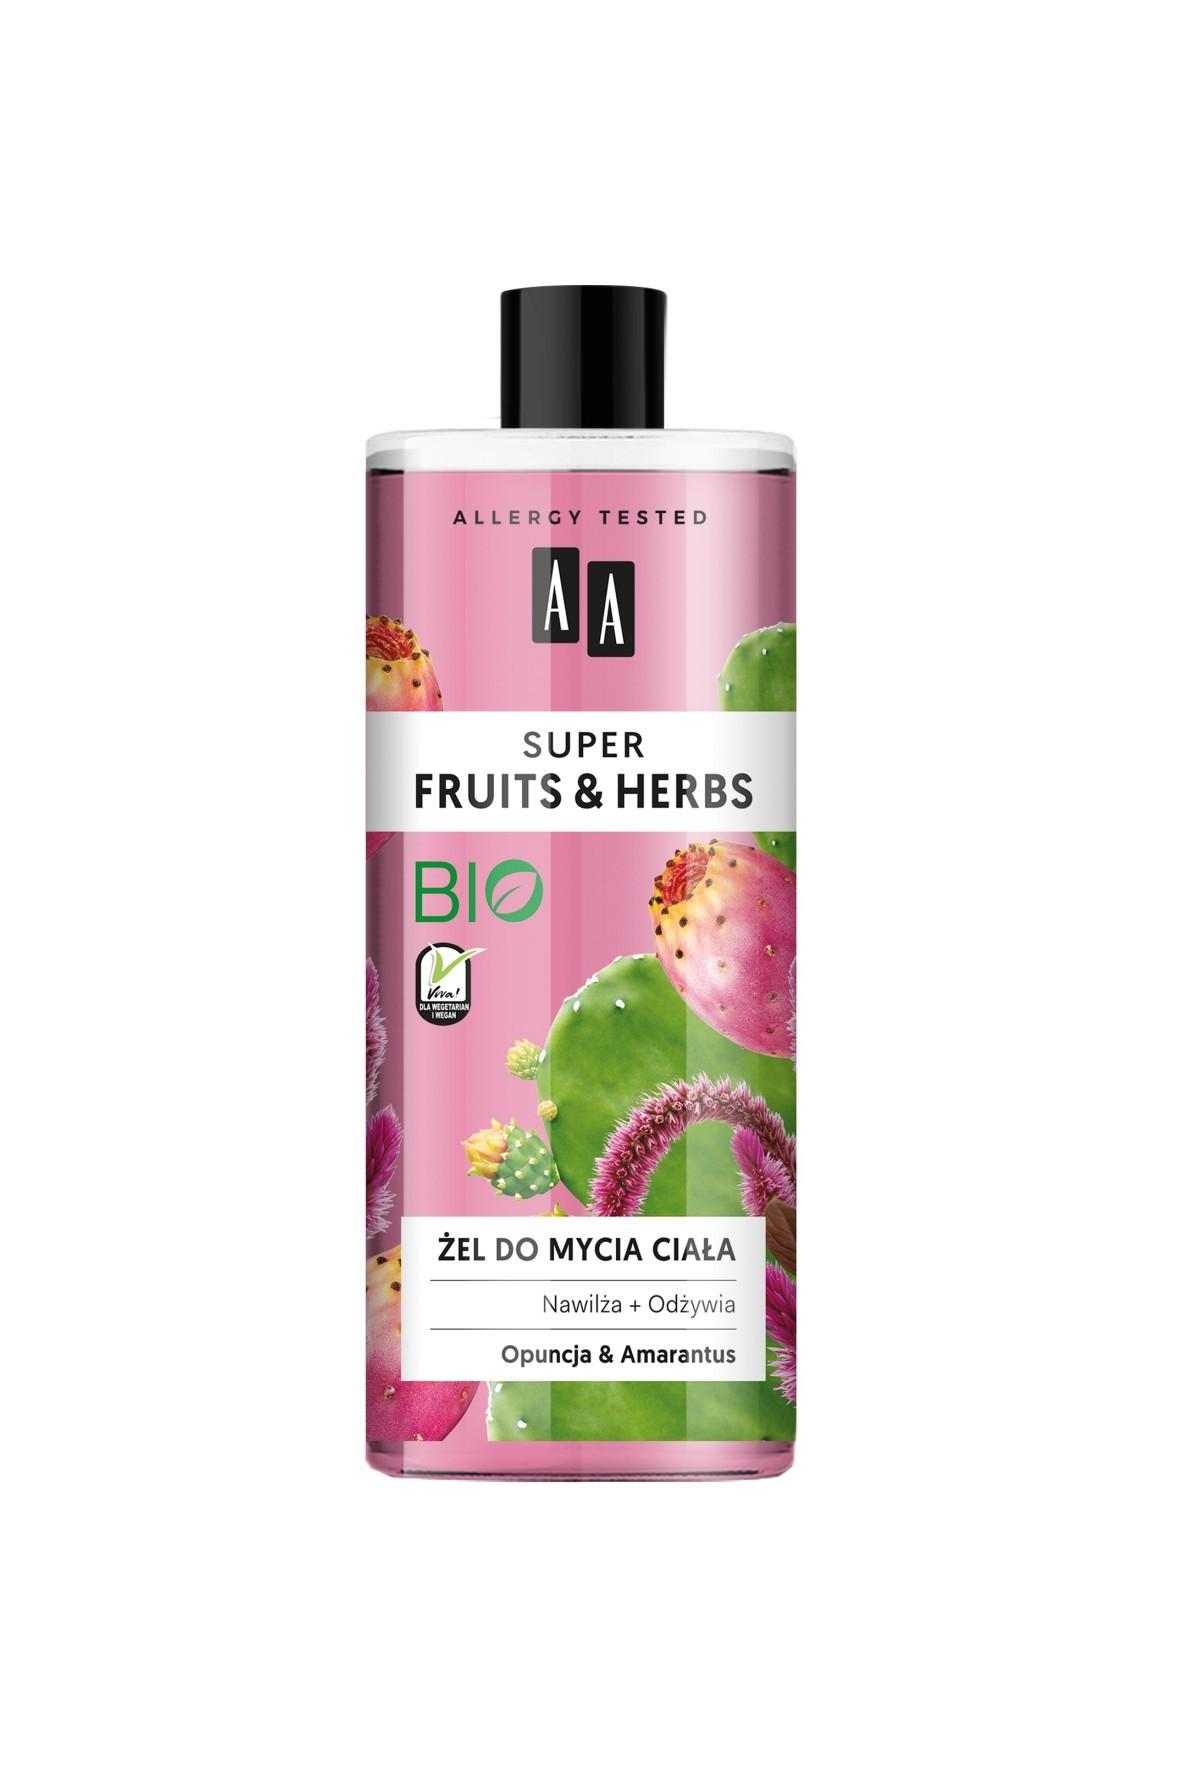 AA Super Fruits&Herbs żel do mycia ciała opuncja&amarantus 500 ml